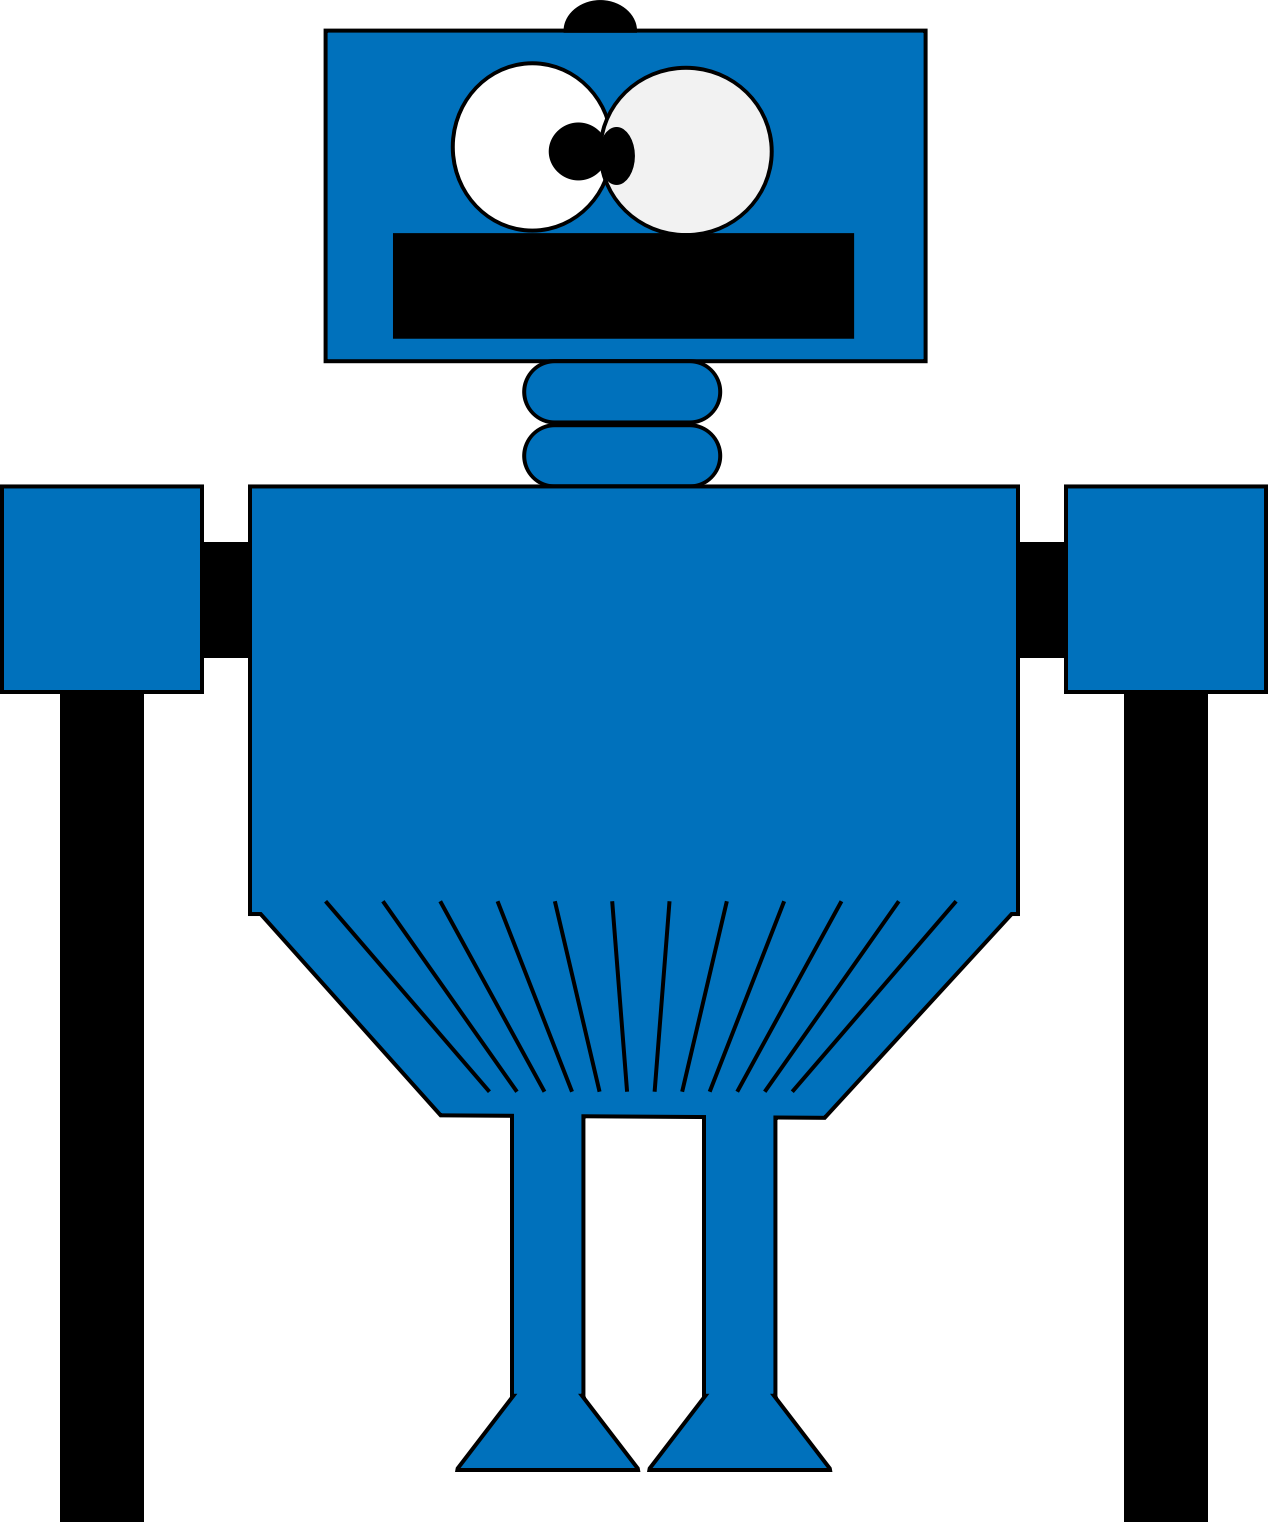 ebook Pro WPF: Windows Presentation Foundation in .NET 3.0